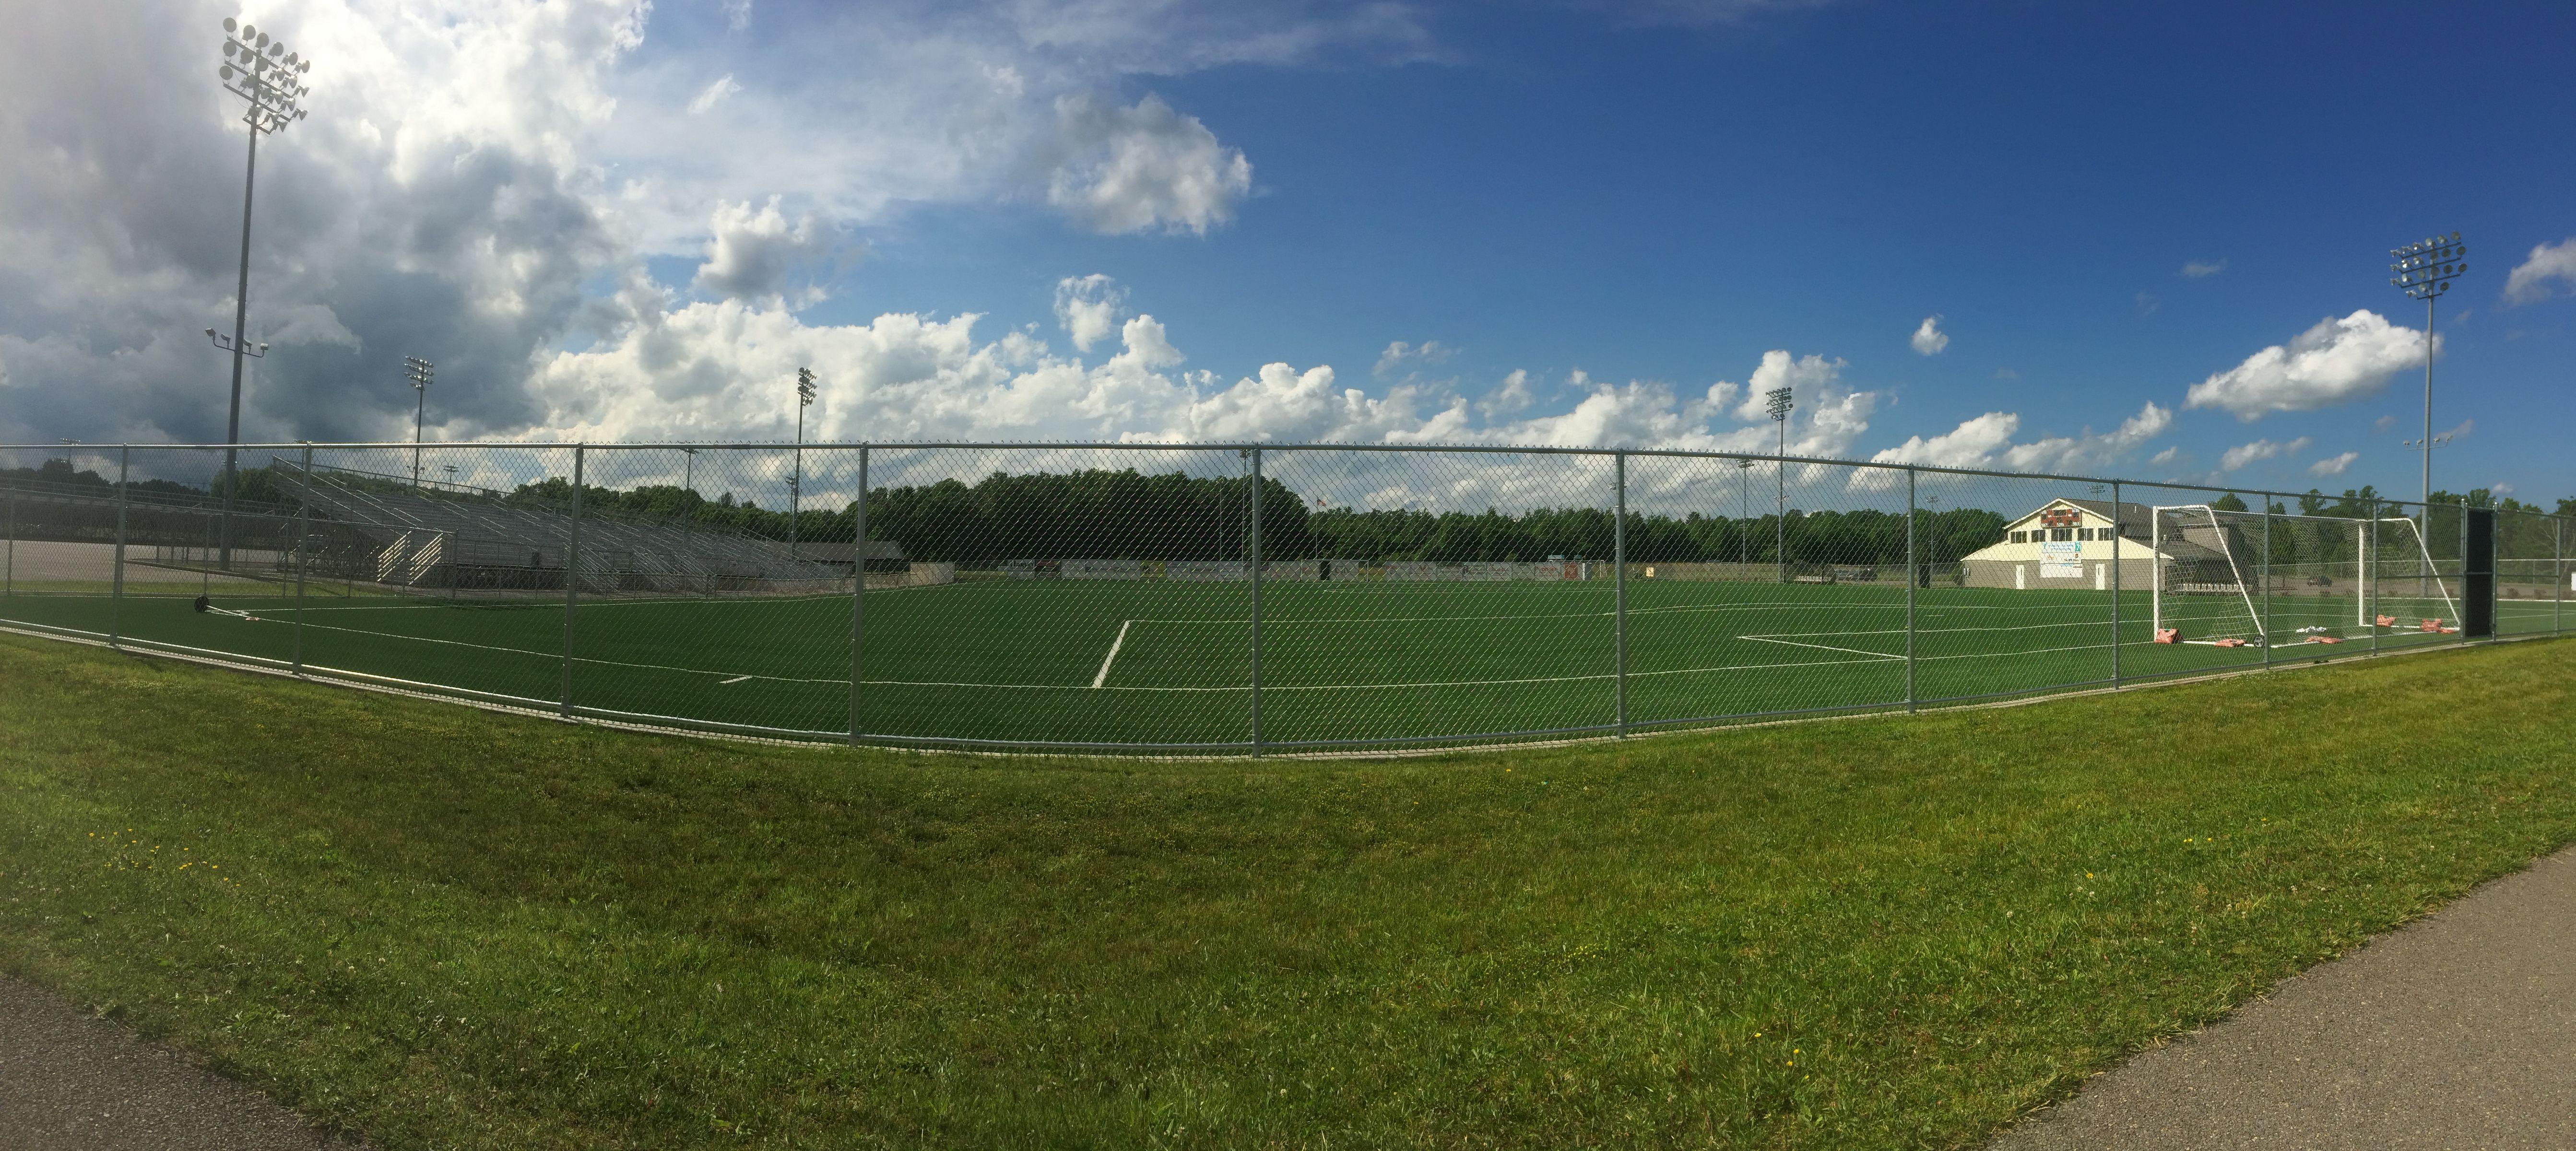 Ymca Soccer Complex Beckley West Virginia Beckley West Virginia Places Ive Been